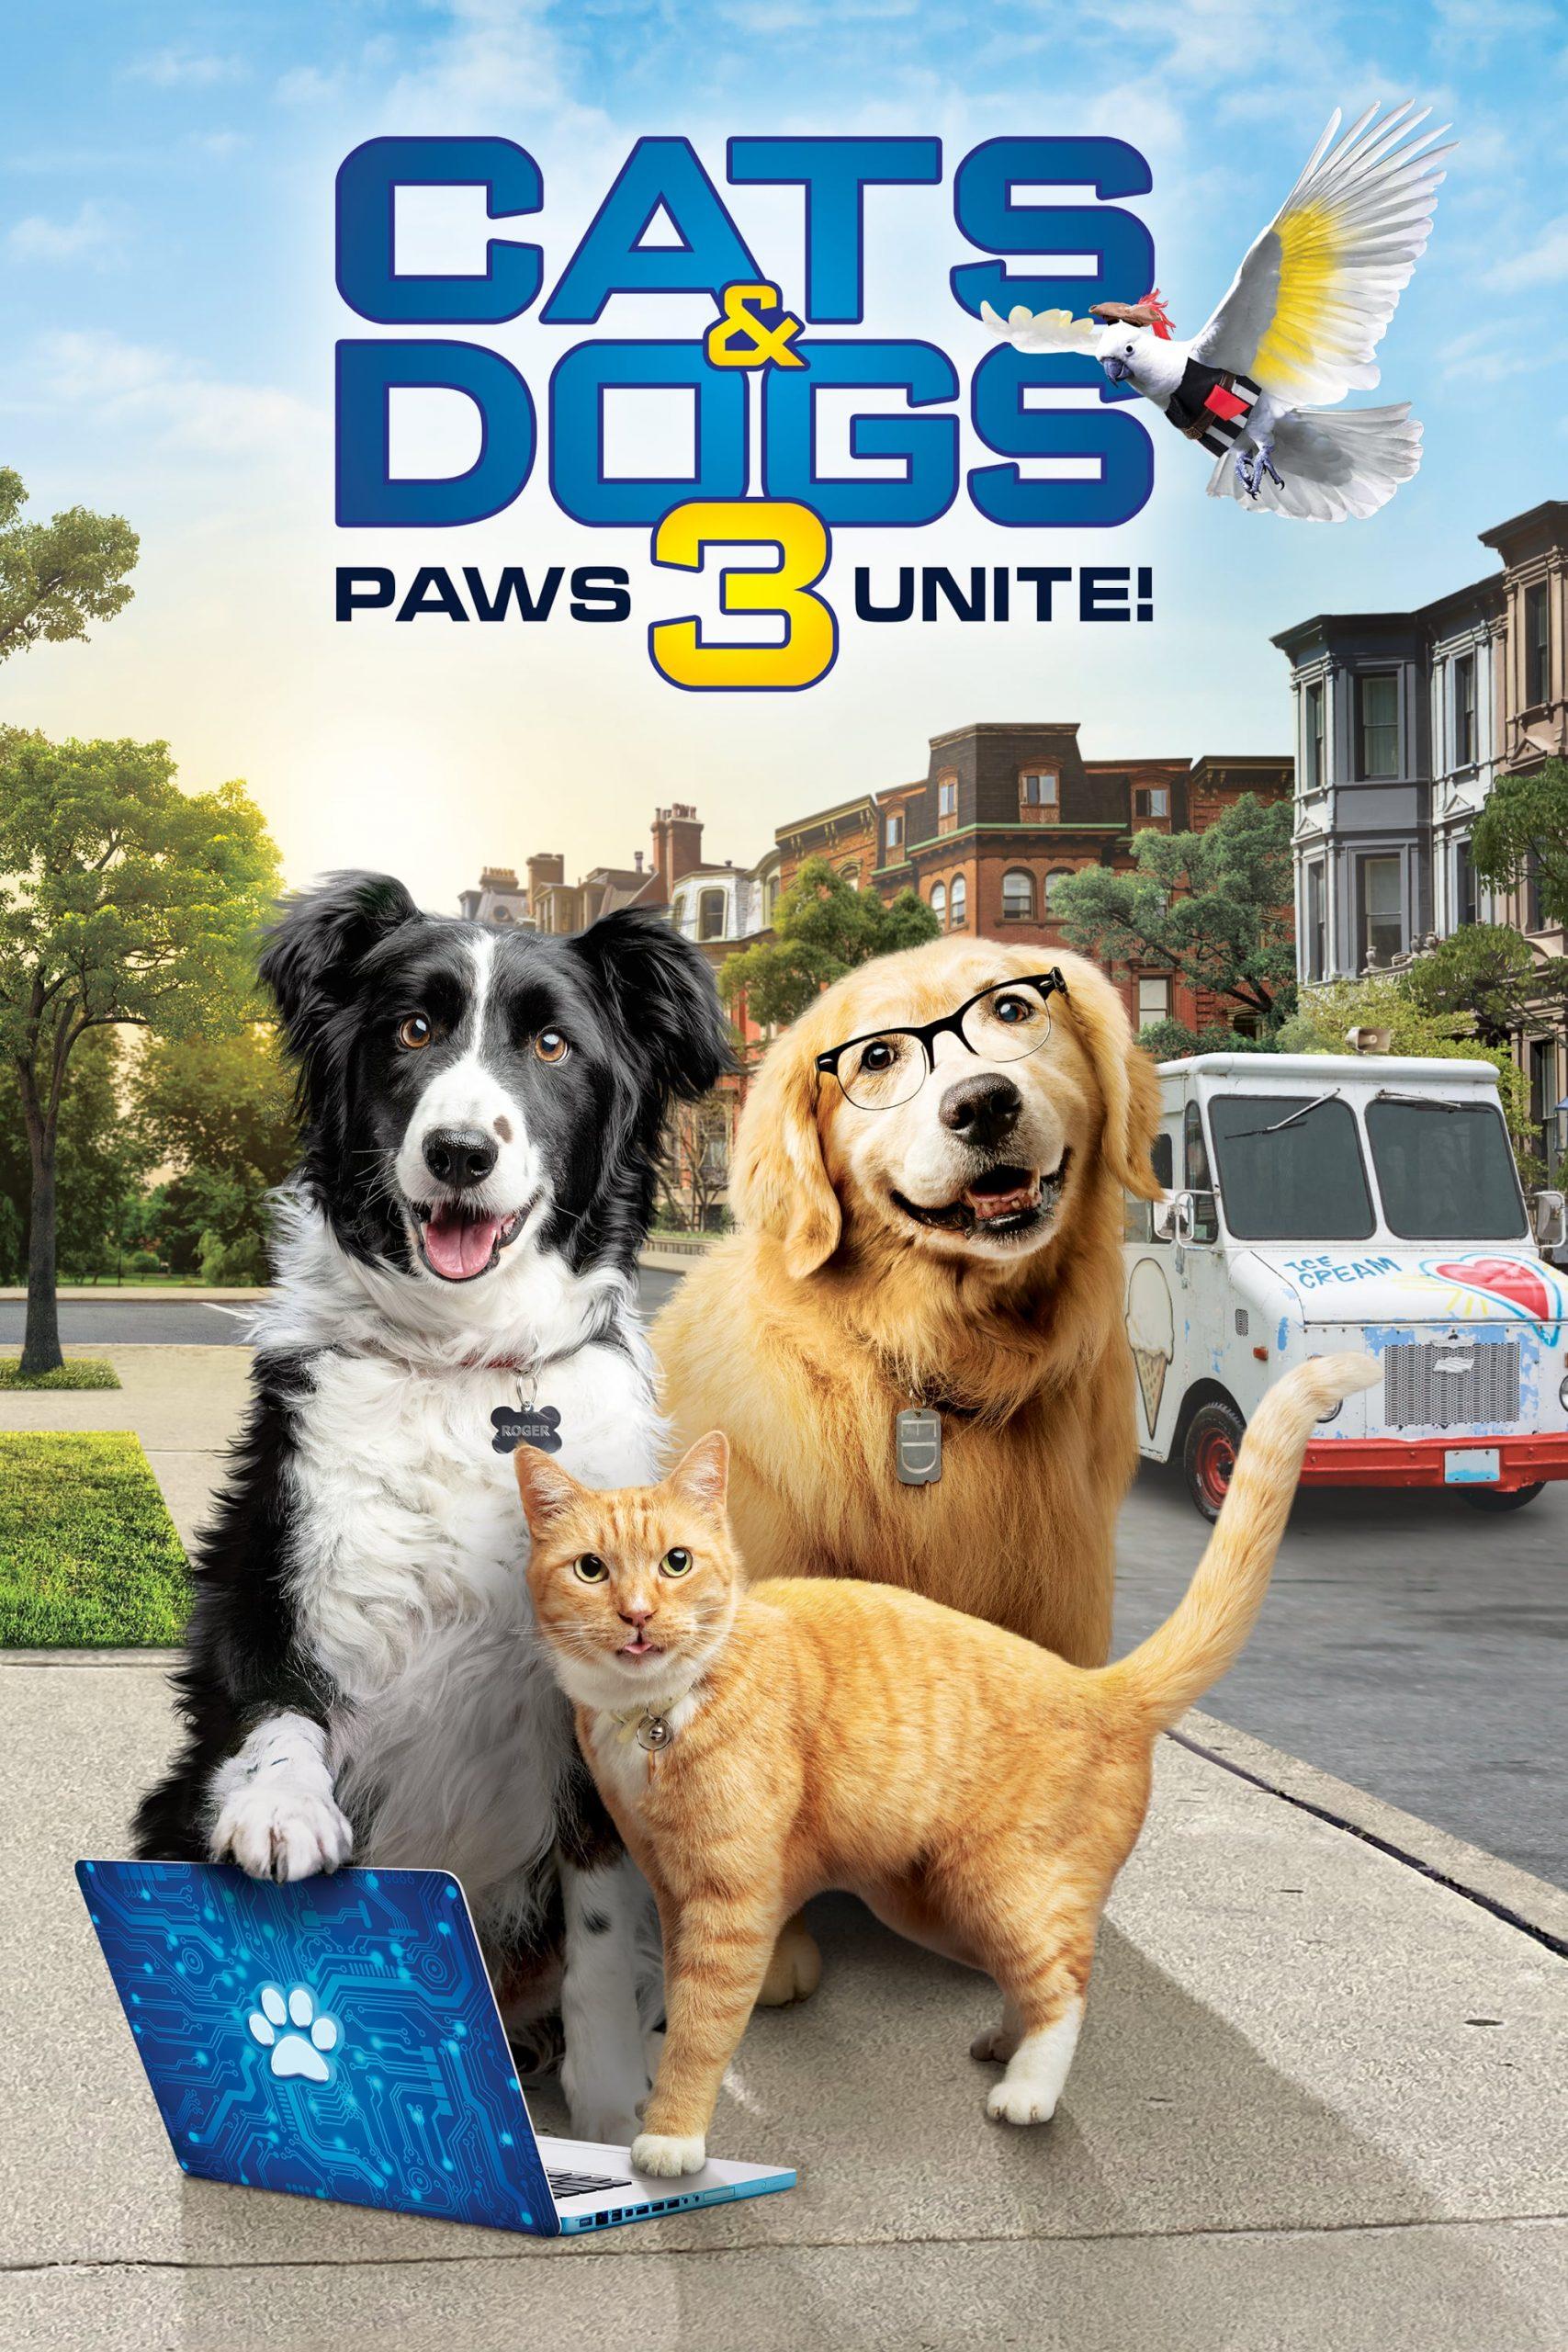 kediler ve kopekler 3 paws unite 3002 poster scaled Kediler ve Köpekler 3: Paws Unite!